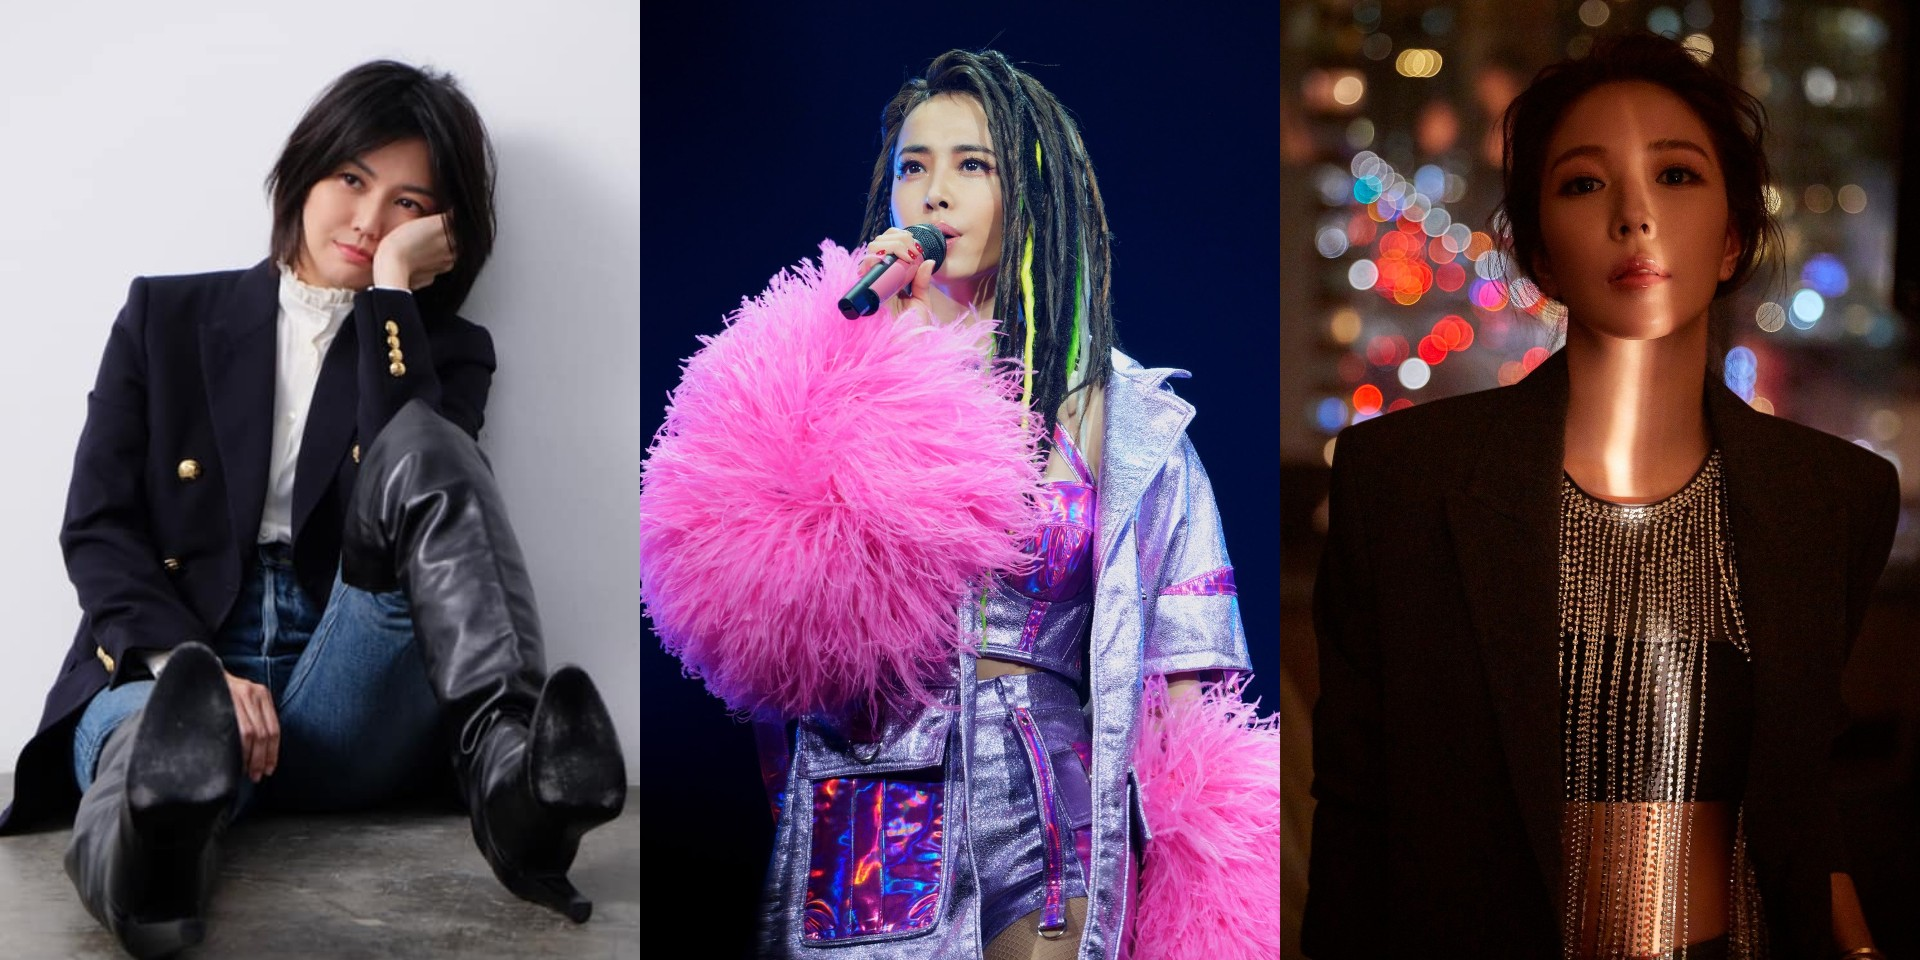 One Love Asia Festival Singapore rescheduled to 2021, Stefanie Sun, Jolin Tsai, BoA, and more to perform